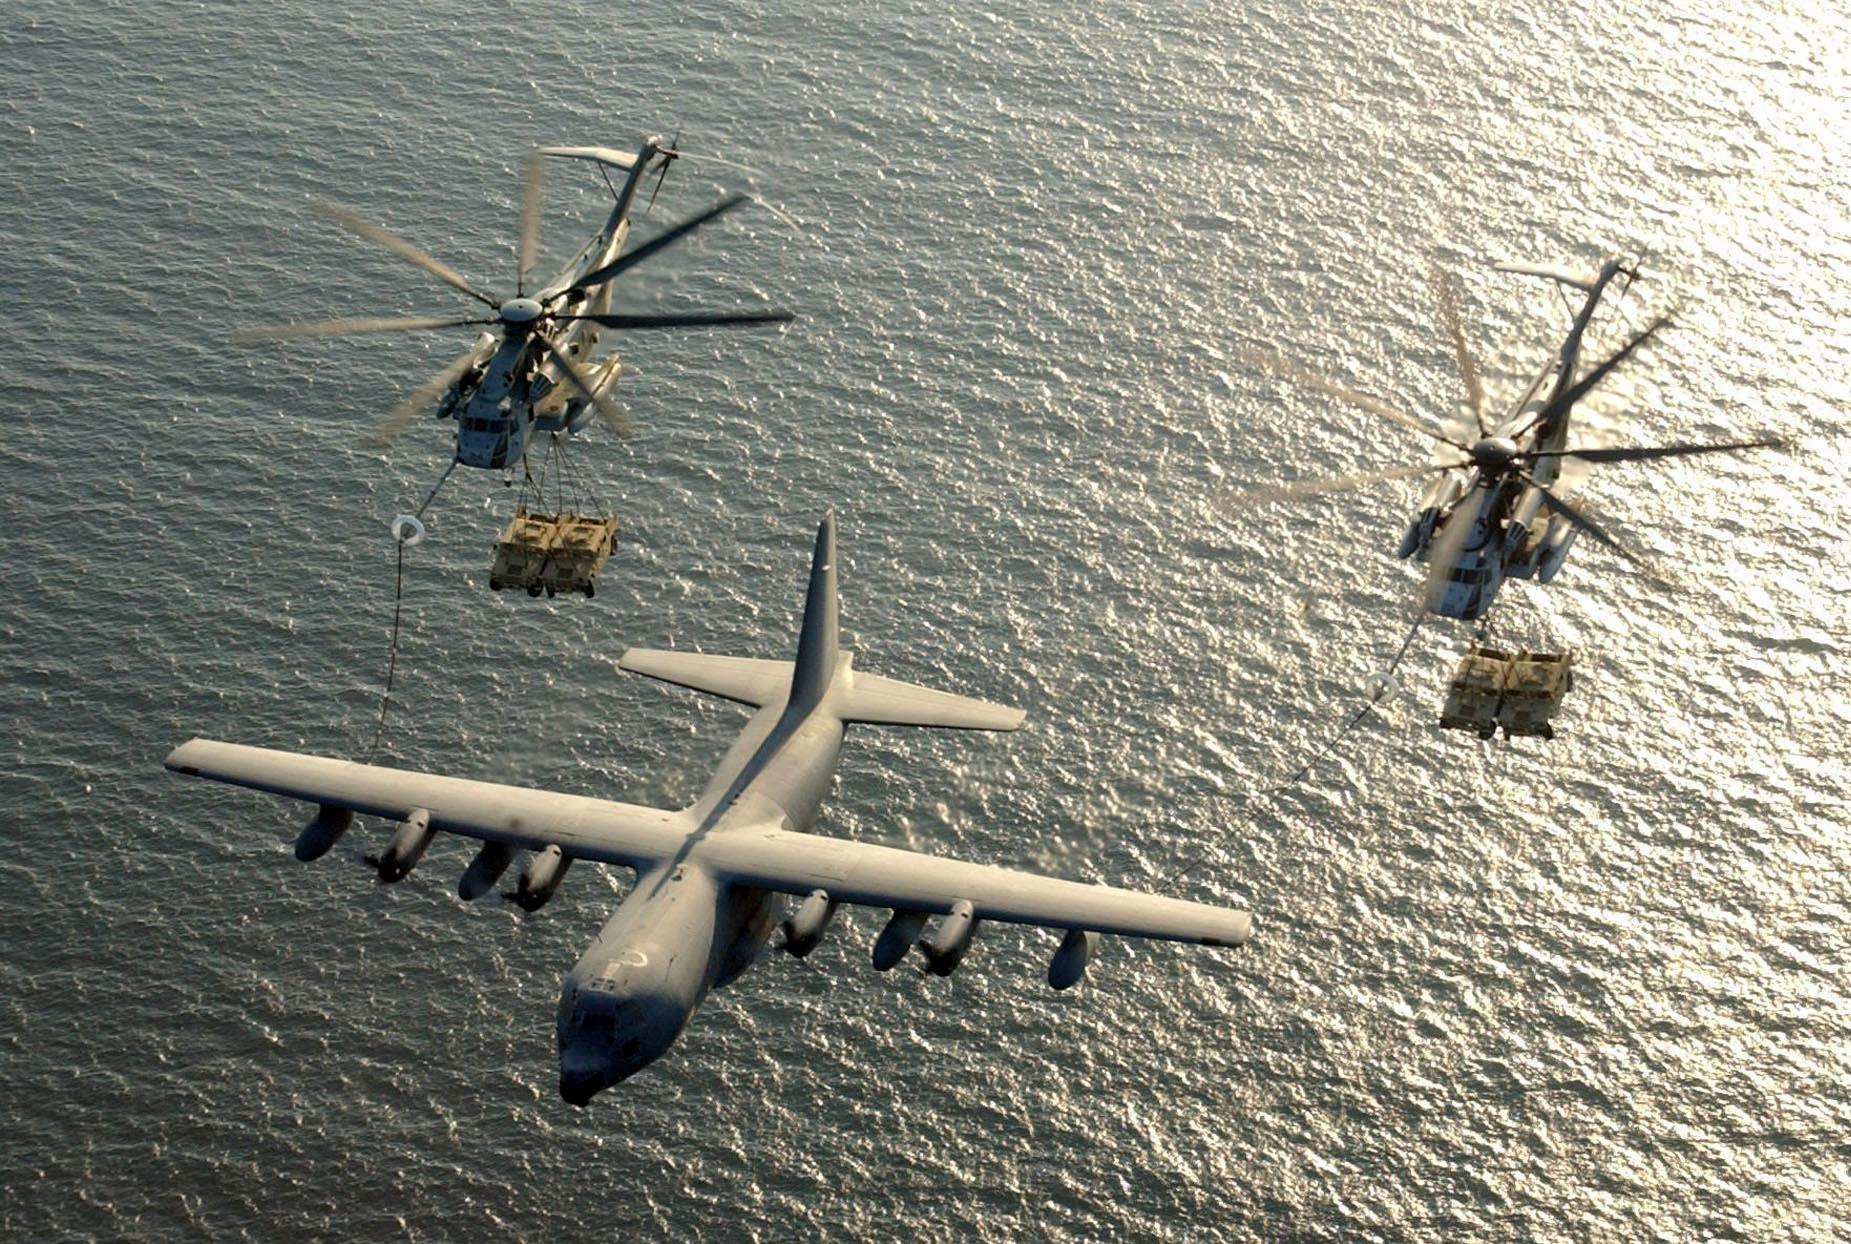 CH-53 Super Stallion Helicopter